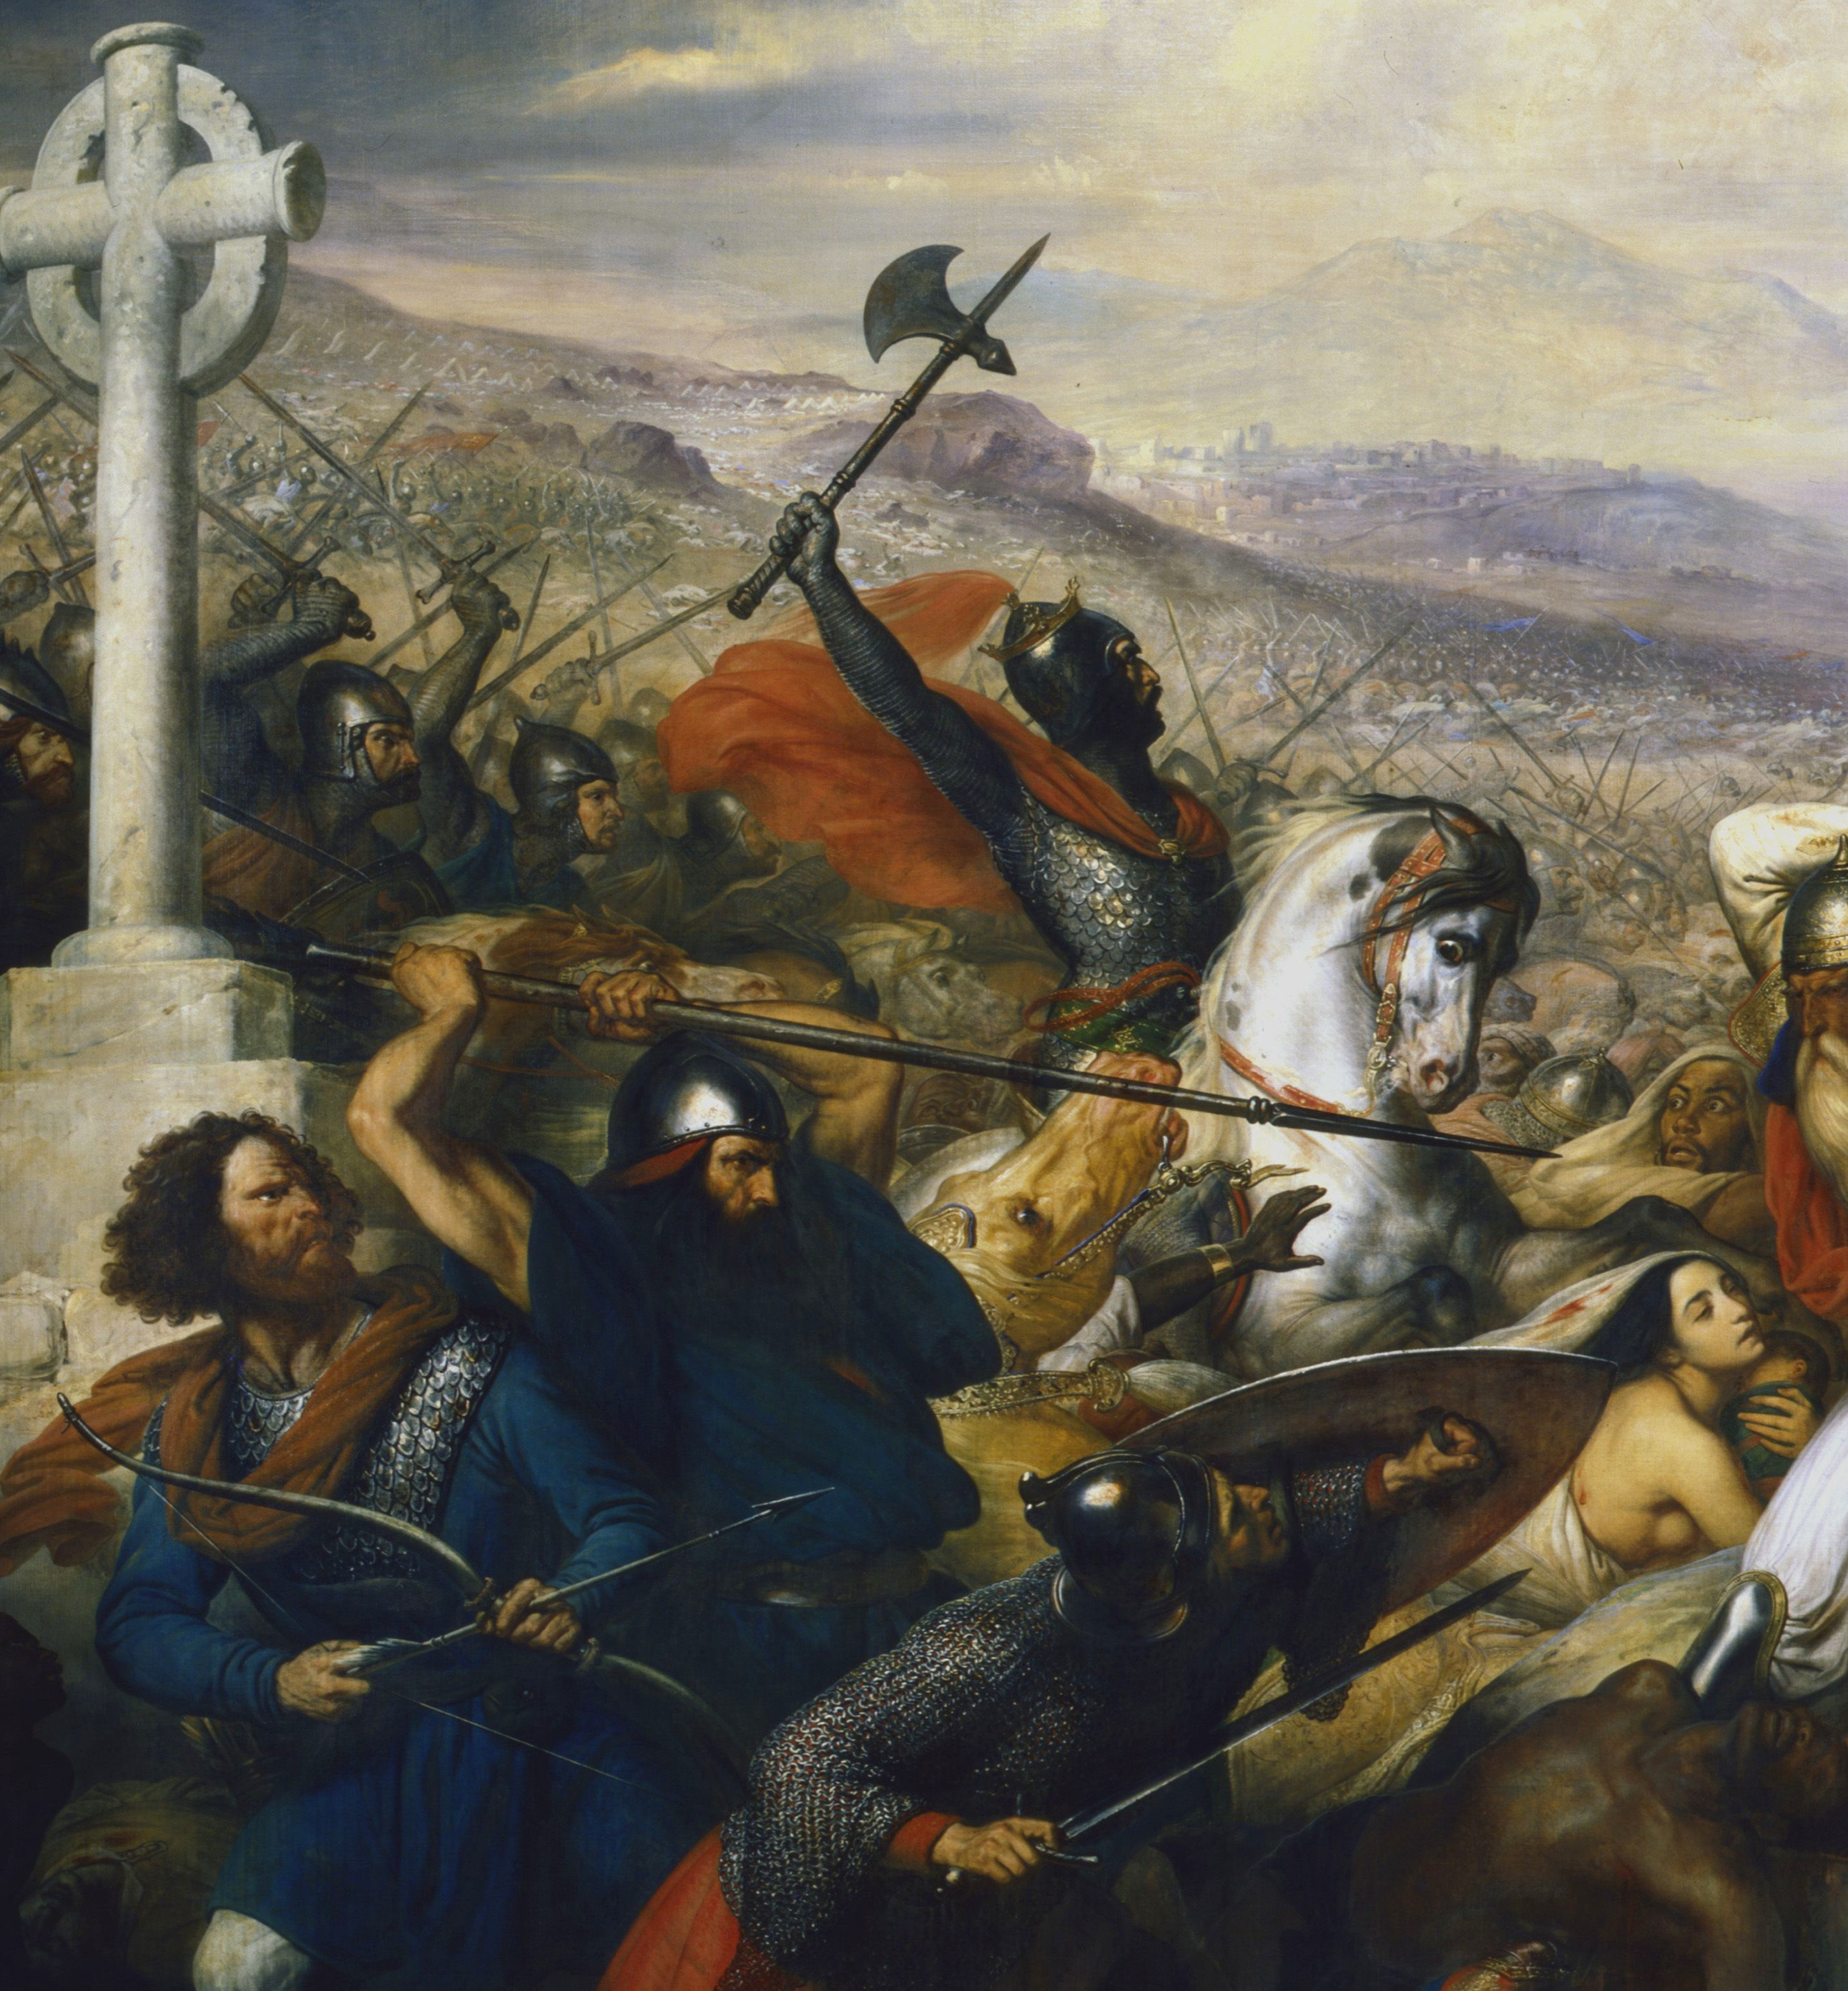 File:Bataille de Poitiers.jpg